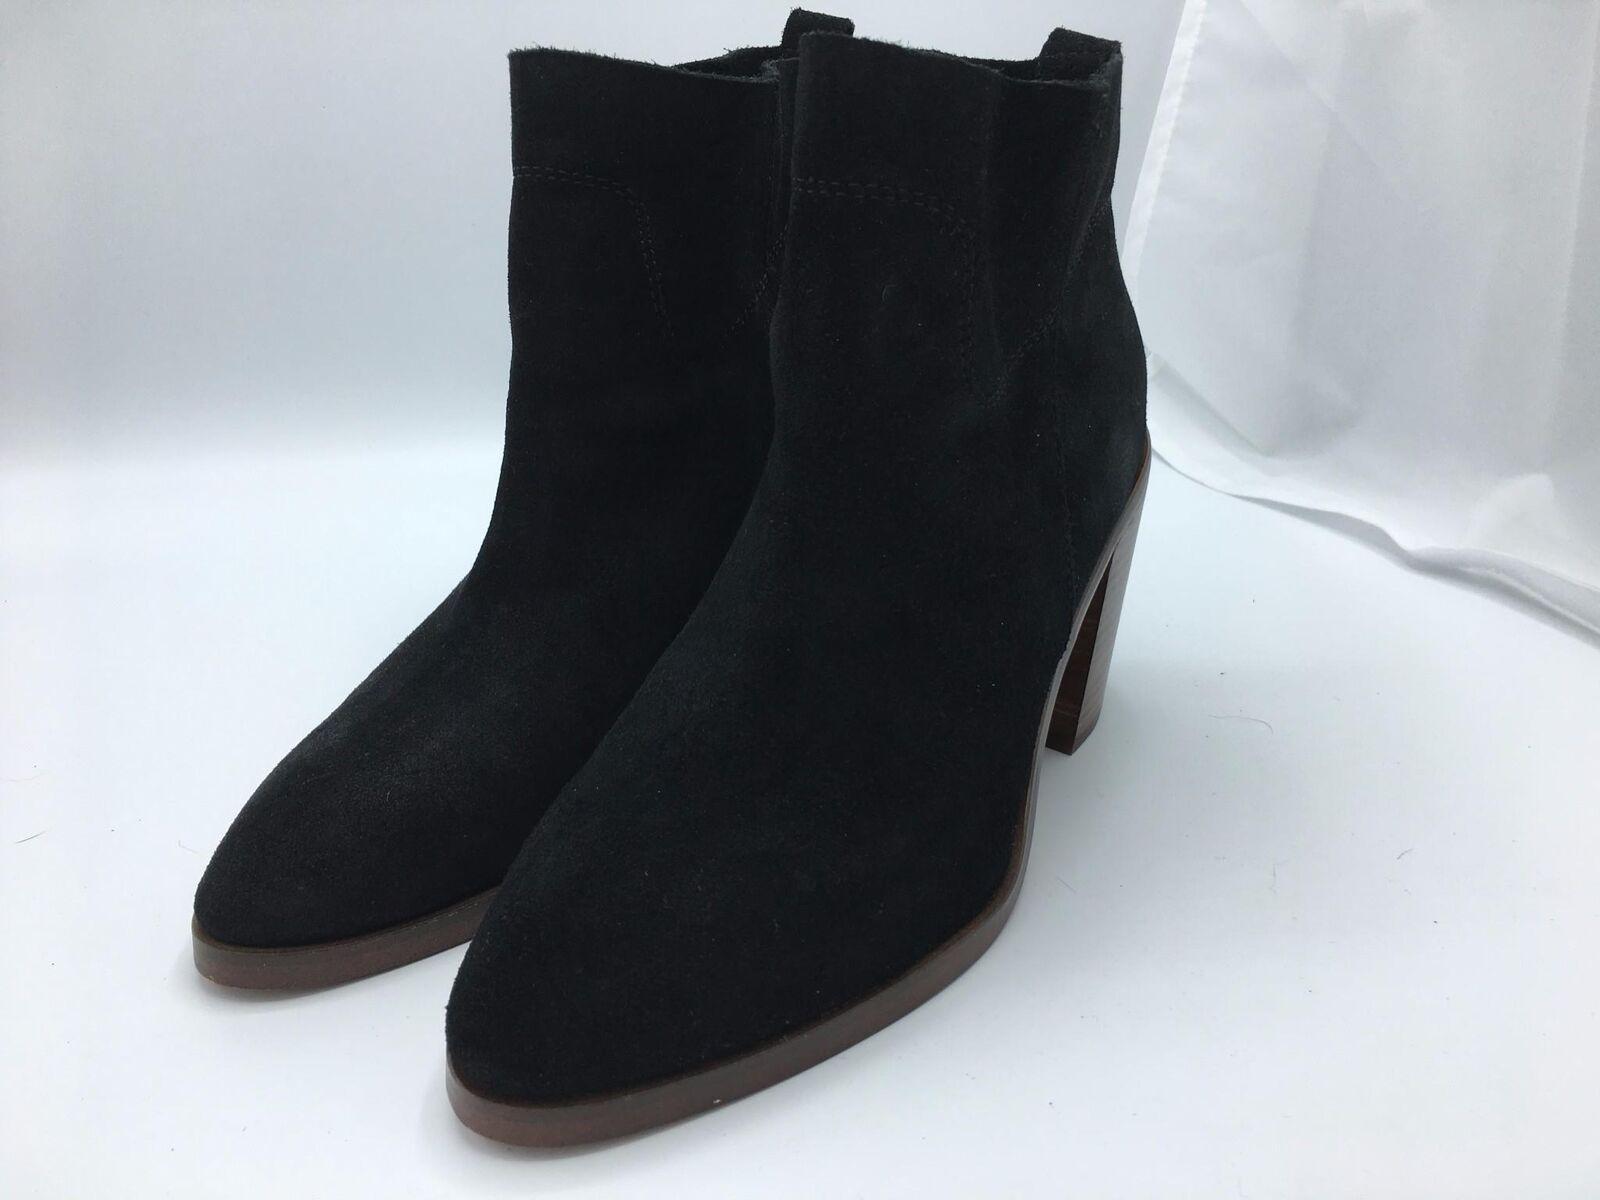 Latigo Women's Jambalaya Bootie Black Suede (1454) Size 7M